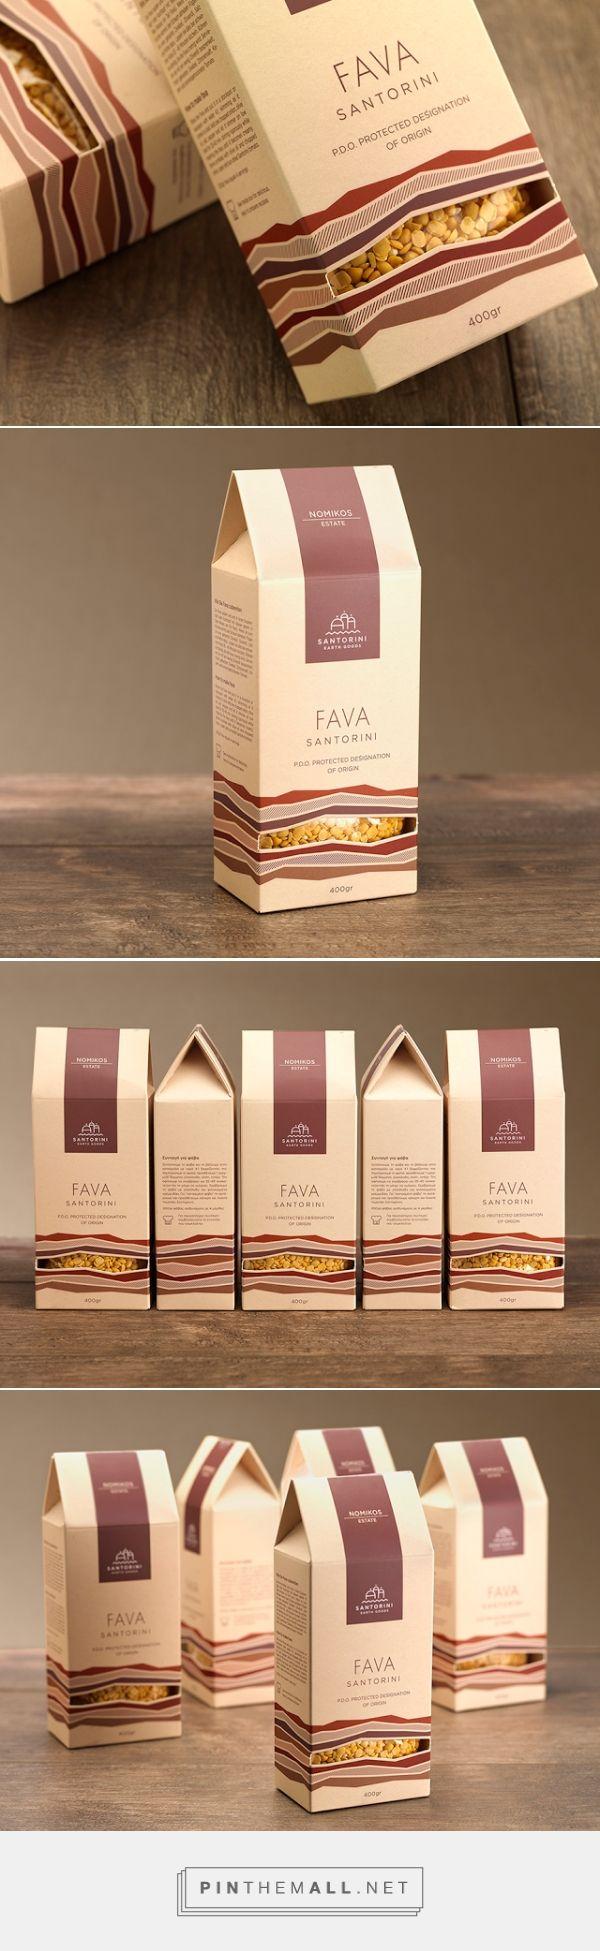 Fava Santorini - Nomikos Estate - Packaging of the World - Creative Package Design Gallery - http://www.packagingoftheworld.com/2016/01/fava-santorini-nomikos-estate.html